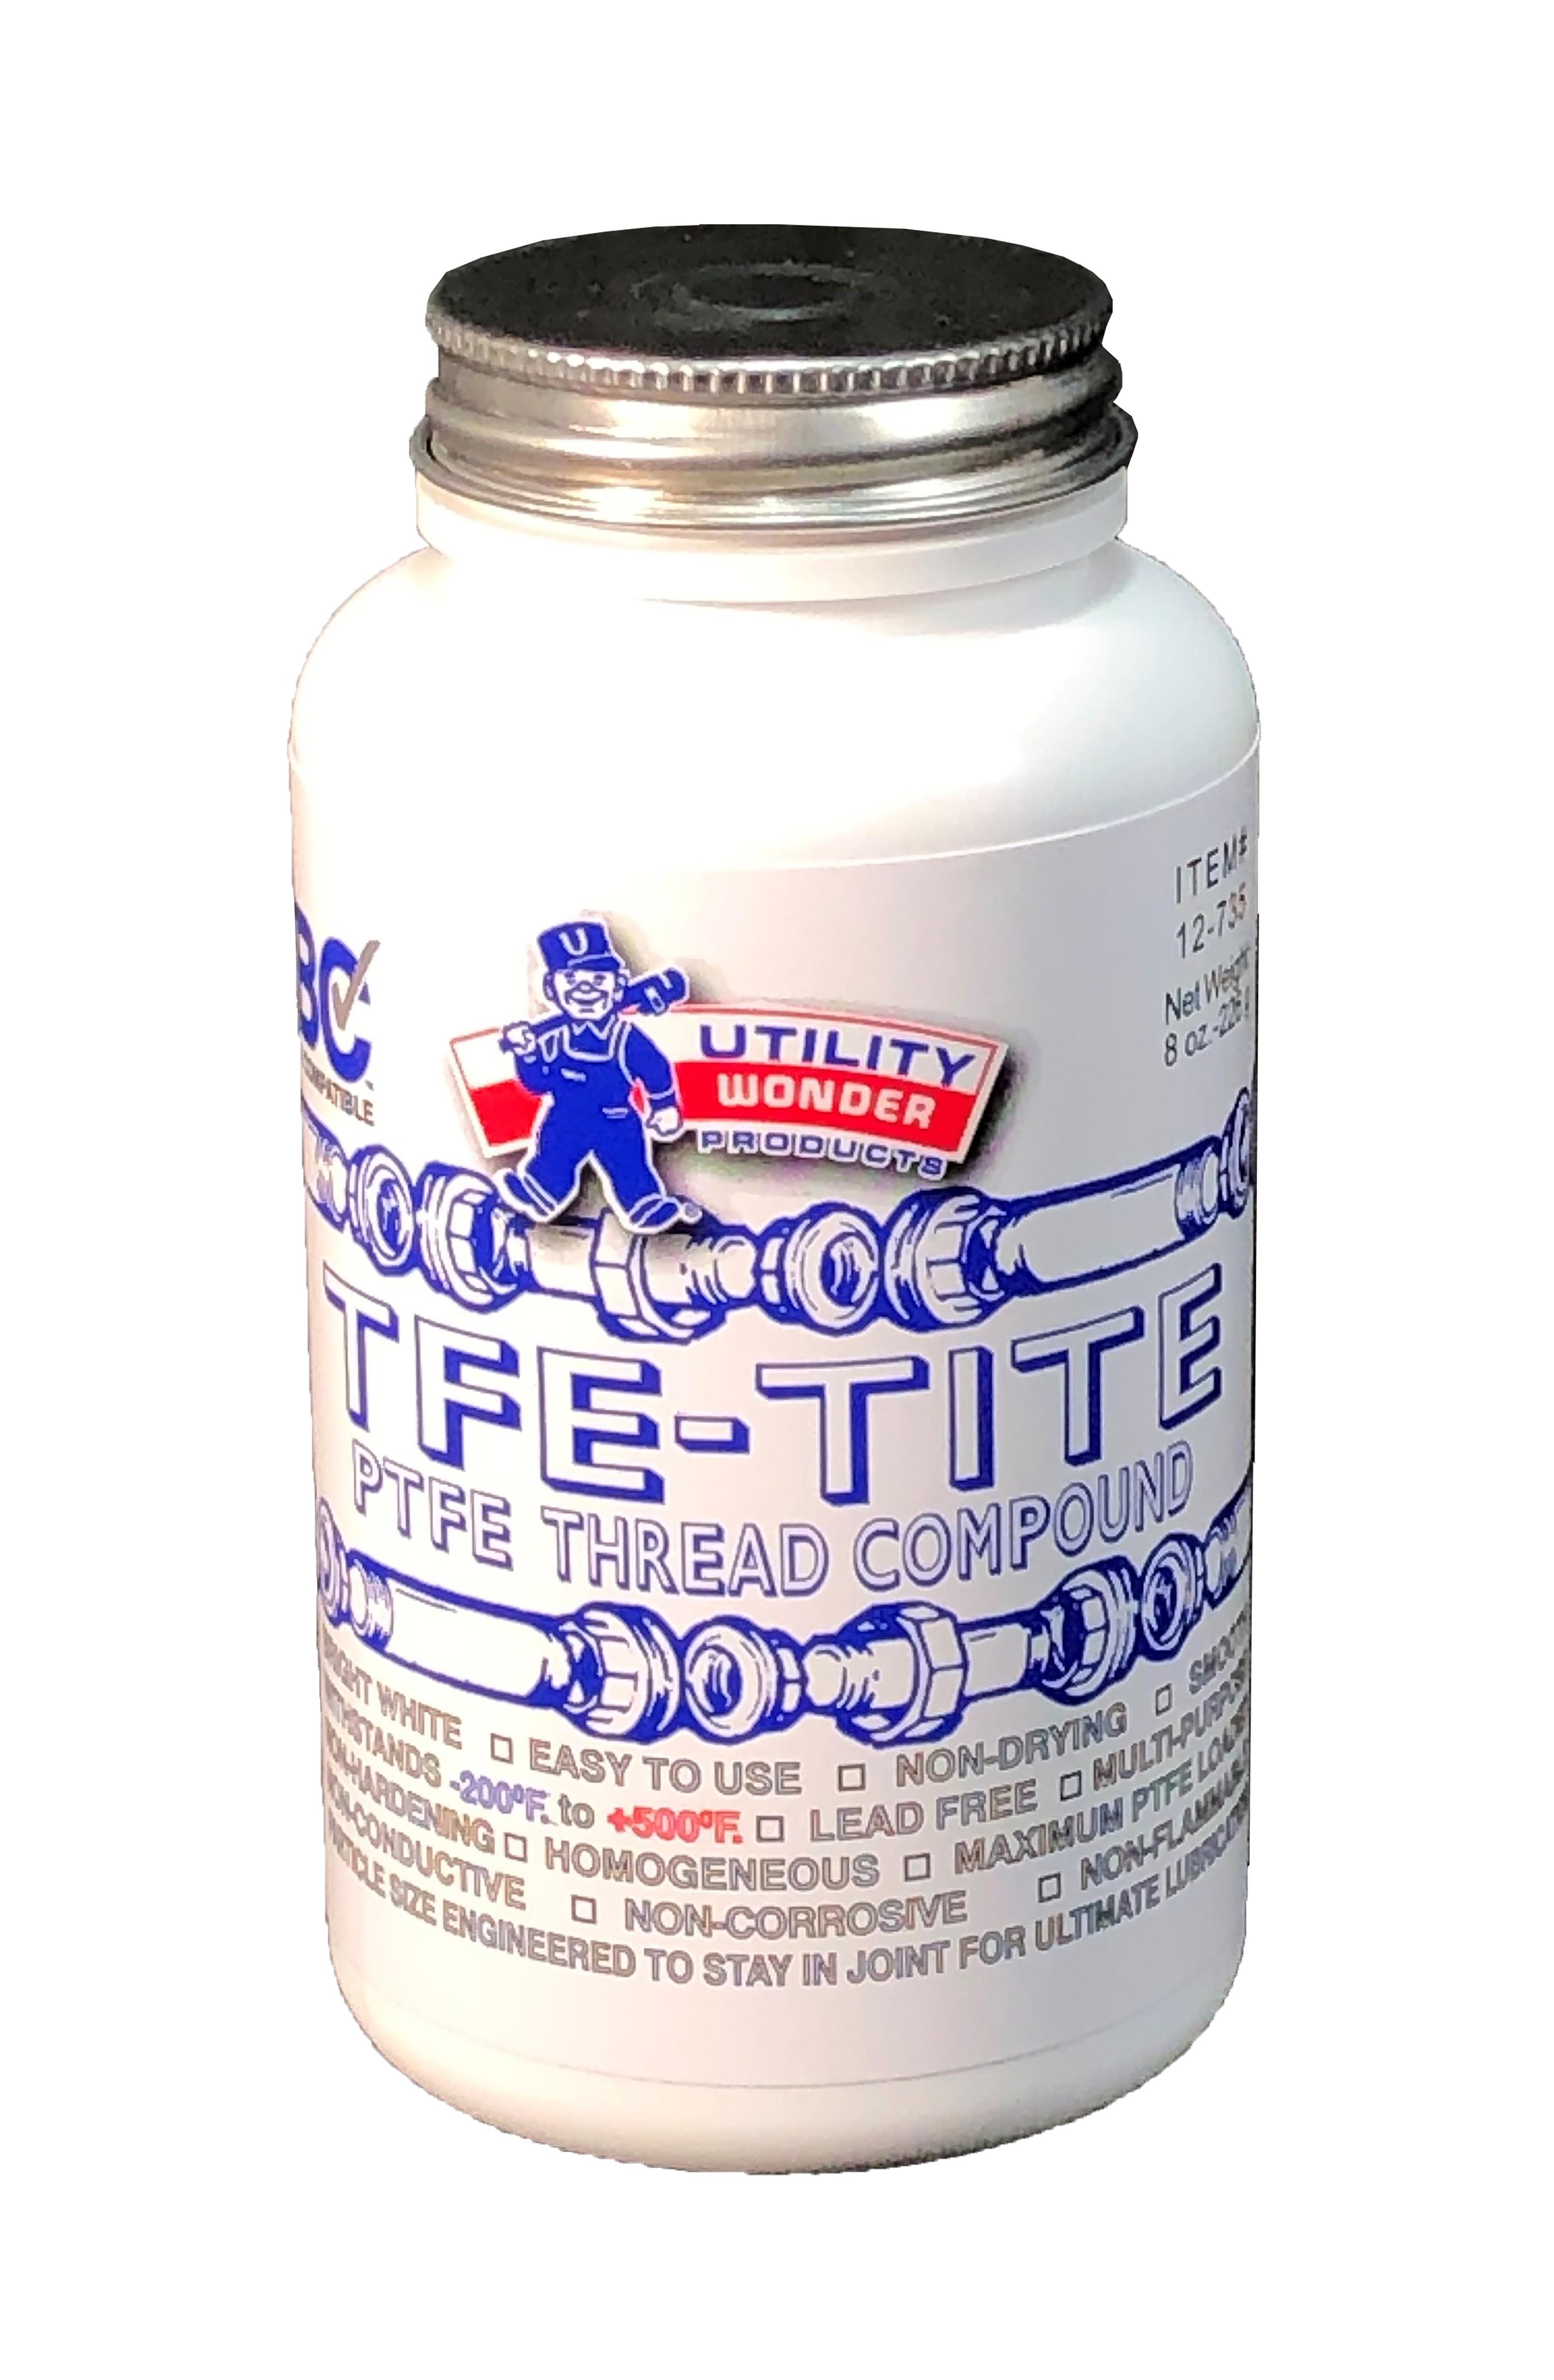 TFE-TITE PTFE THREAD COMPOUND